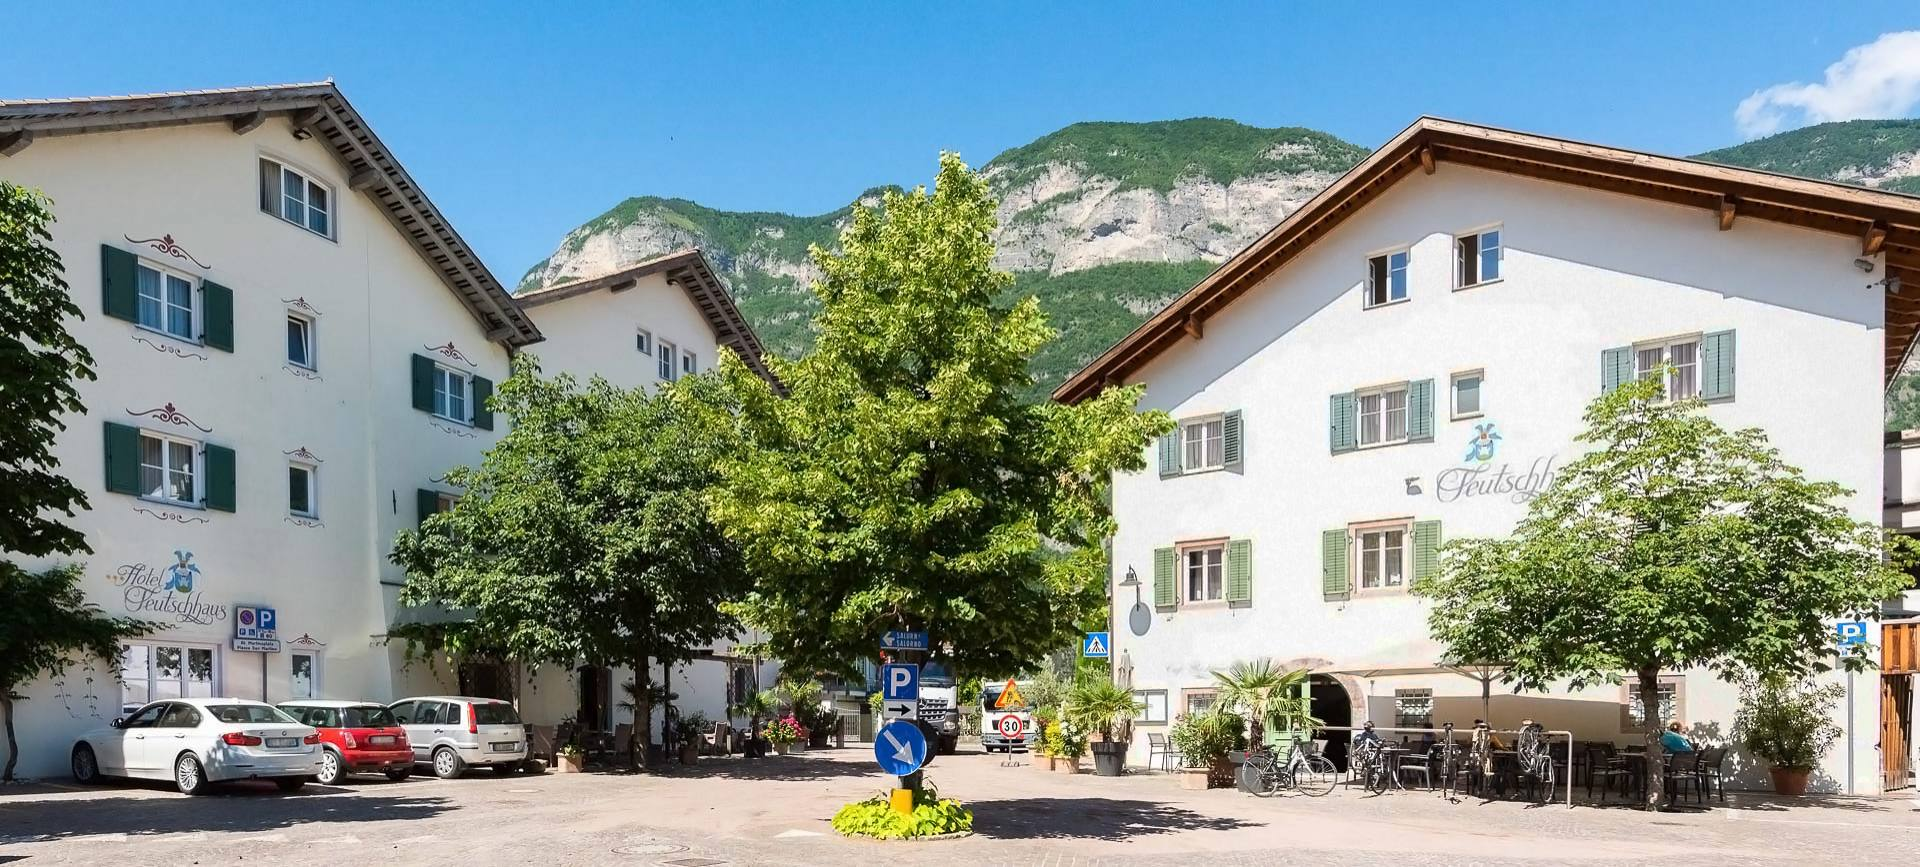 Hotel Teutschhaus